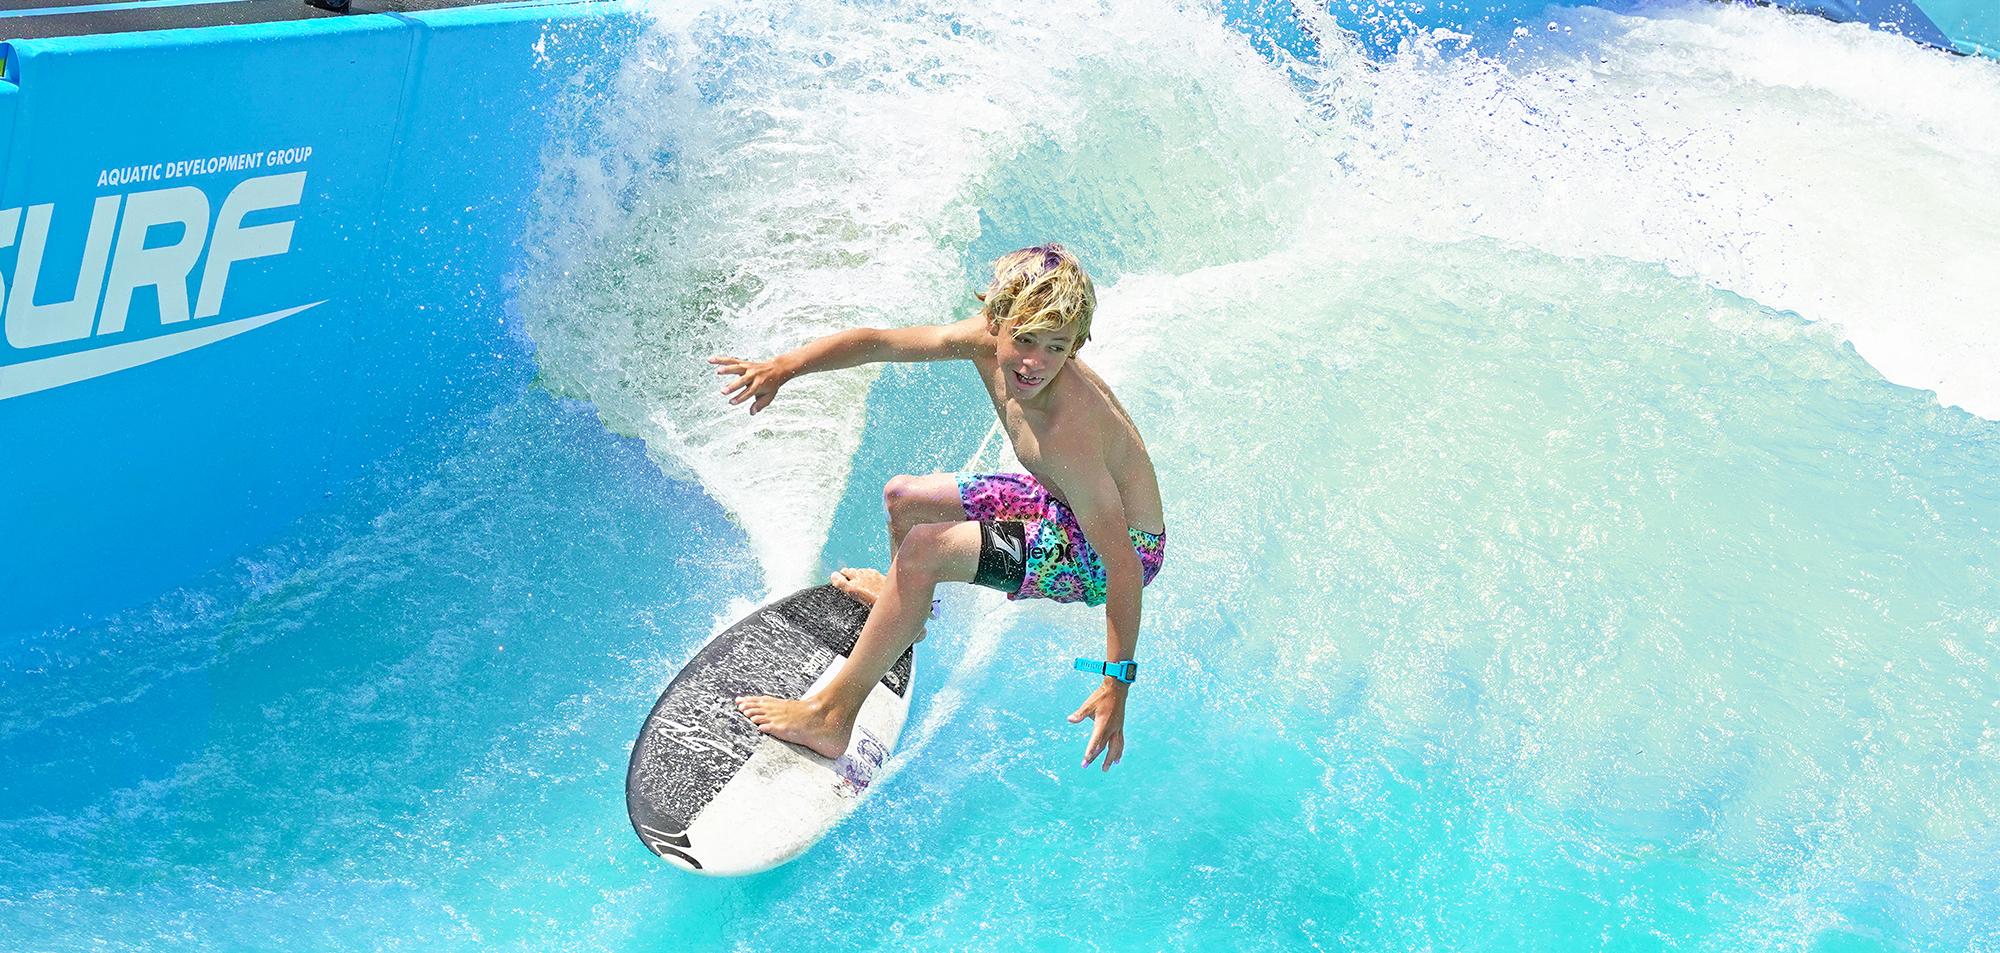 deep water rapid stationary surf wave epicsurf